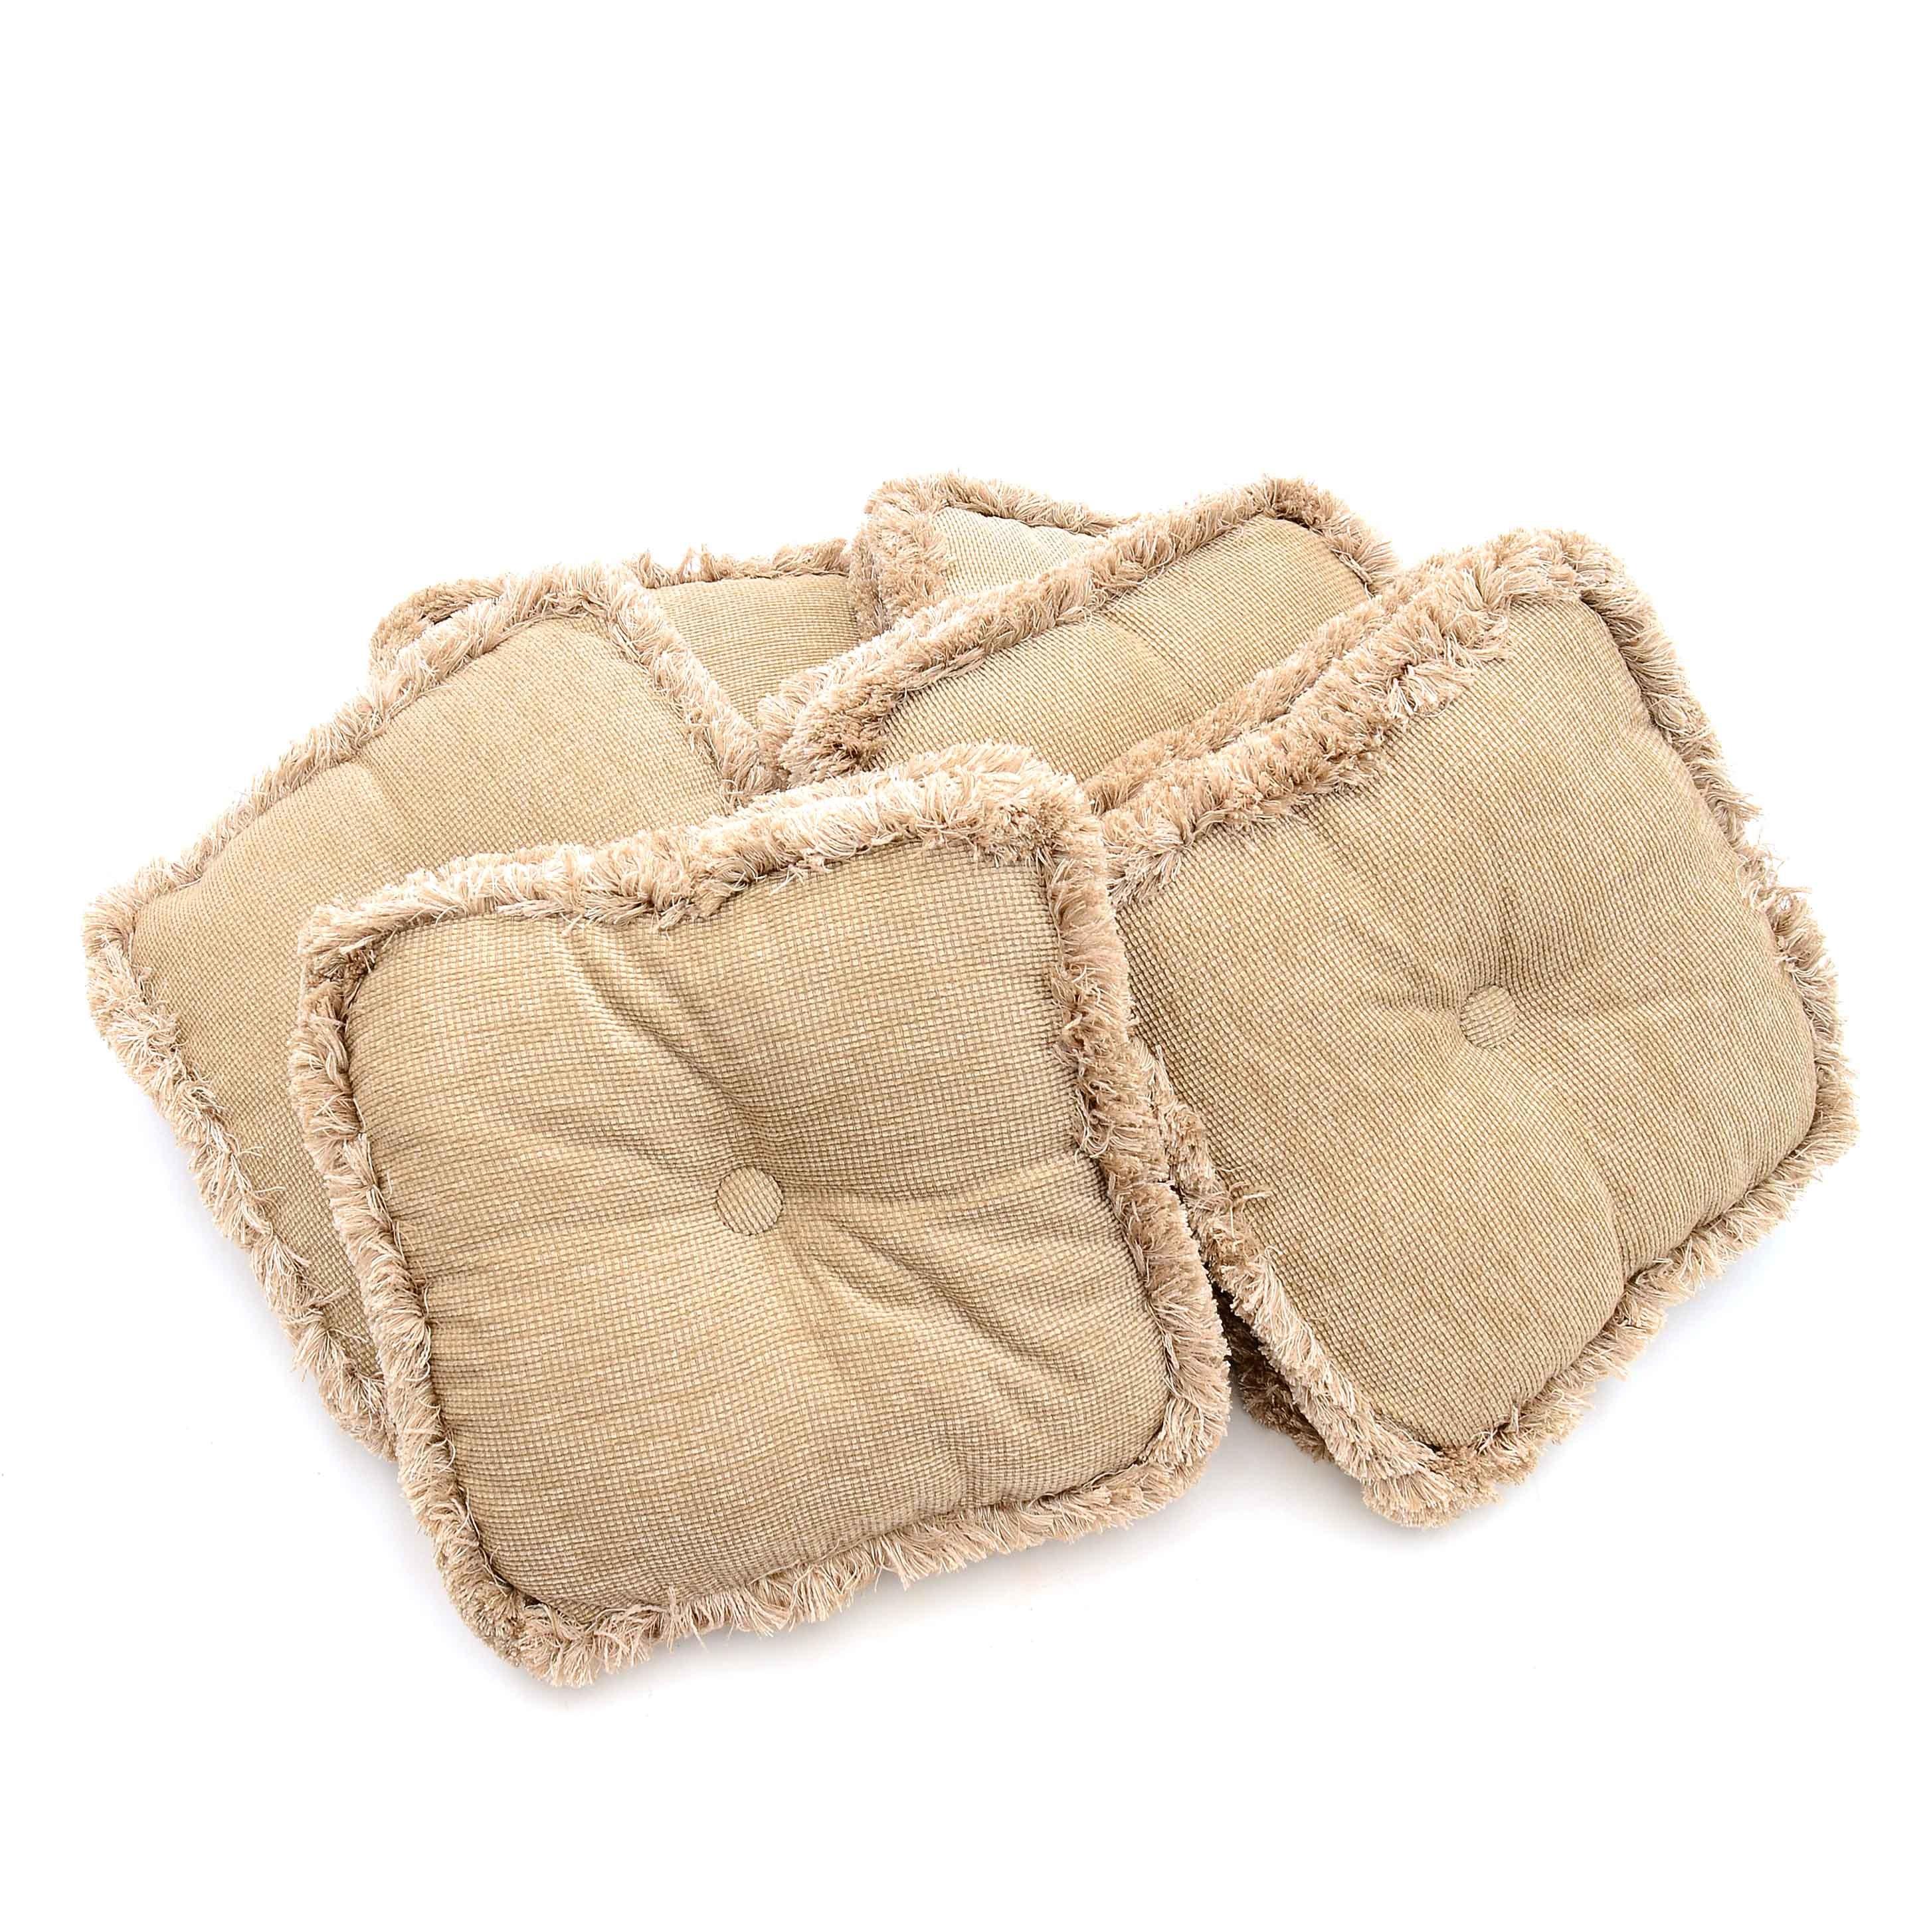 Woven Beige Seat Cushions